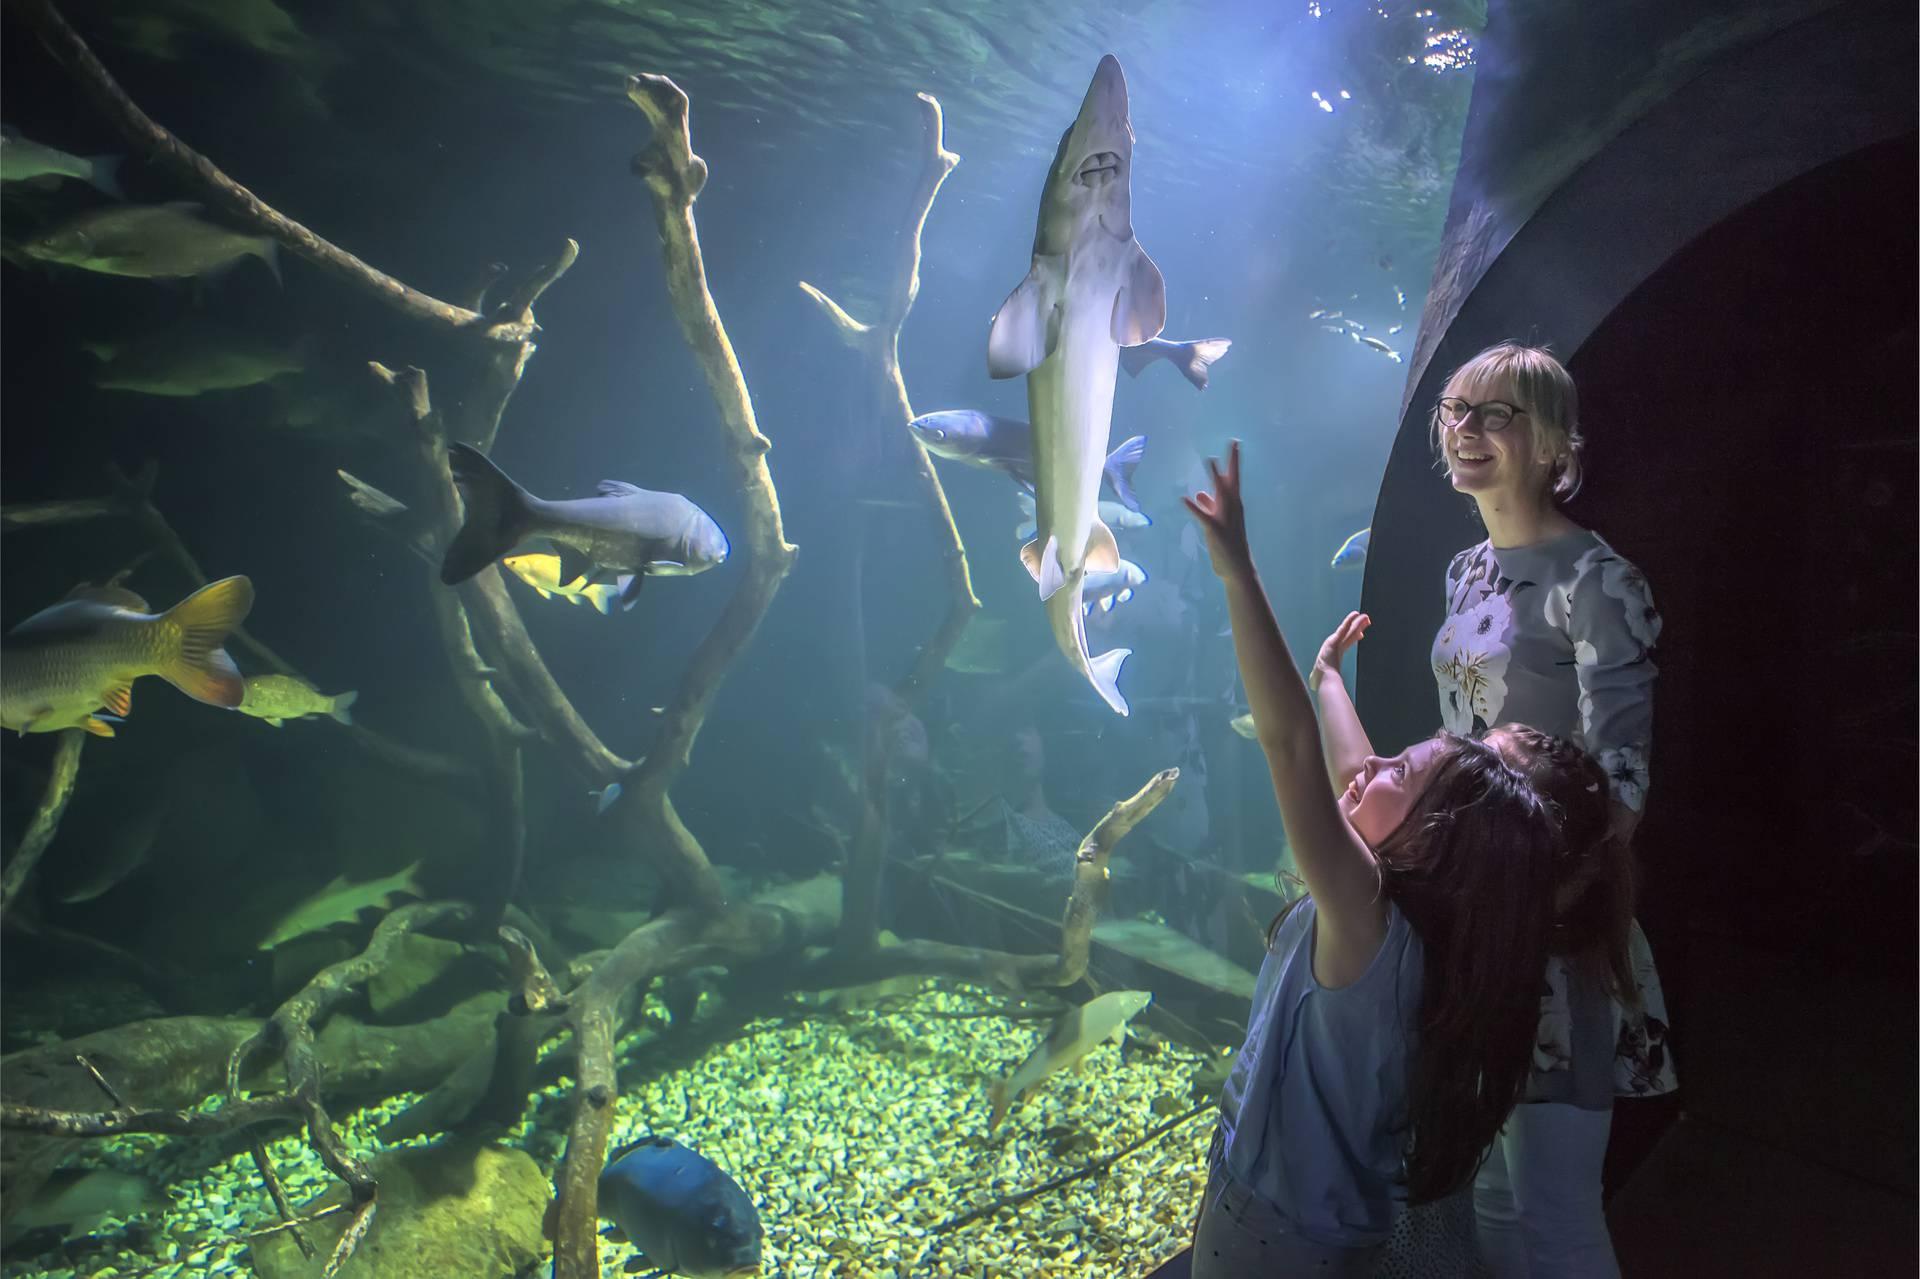 Aquatika-slatkovodni akvarij Karlovac časti besplatnim ulazom u akvarij